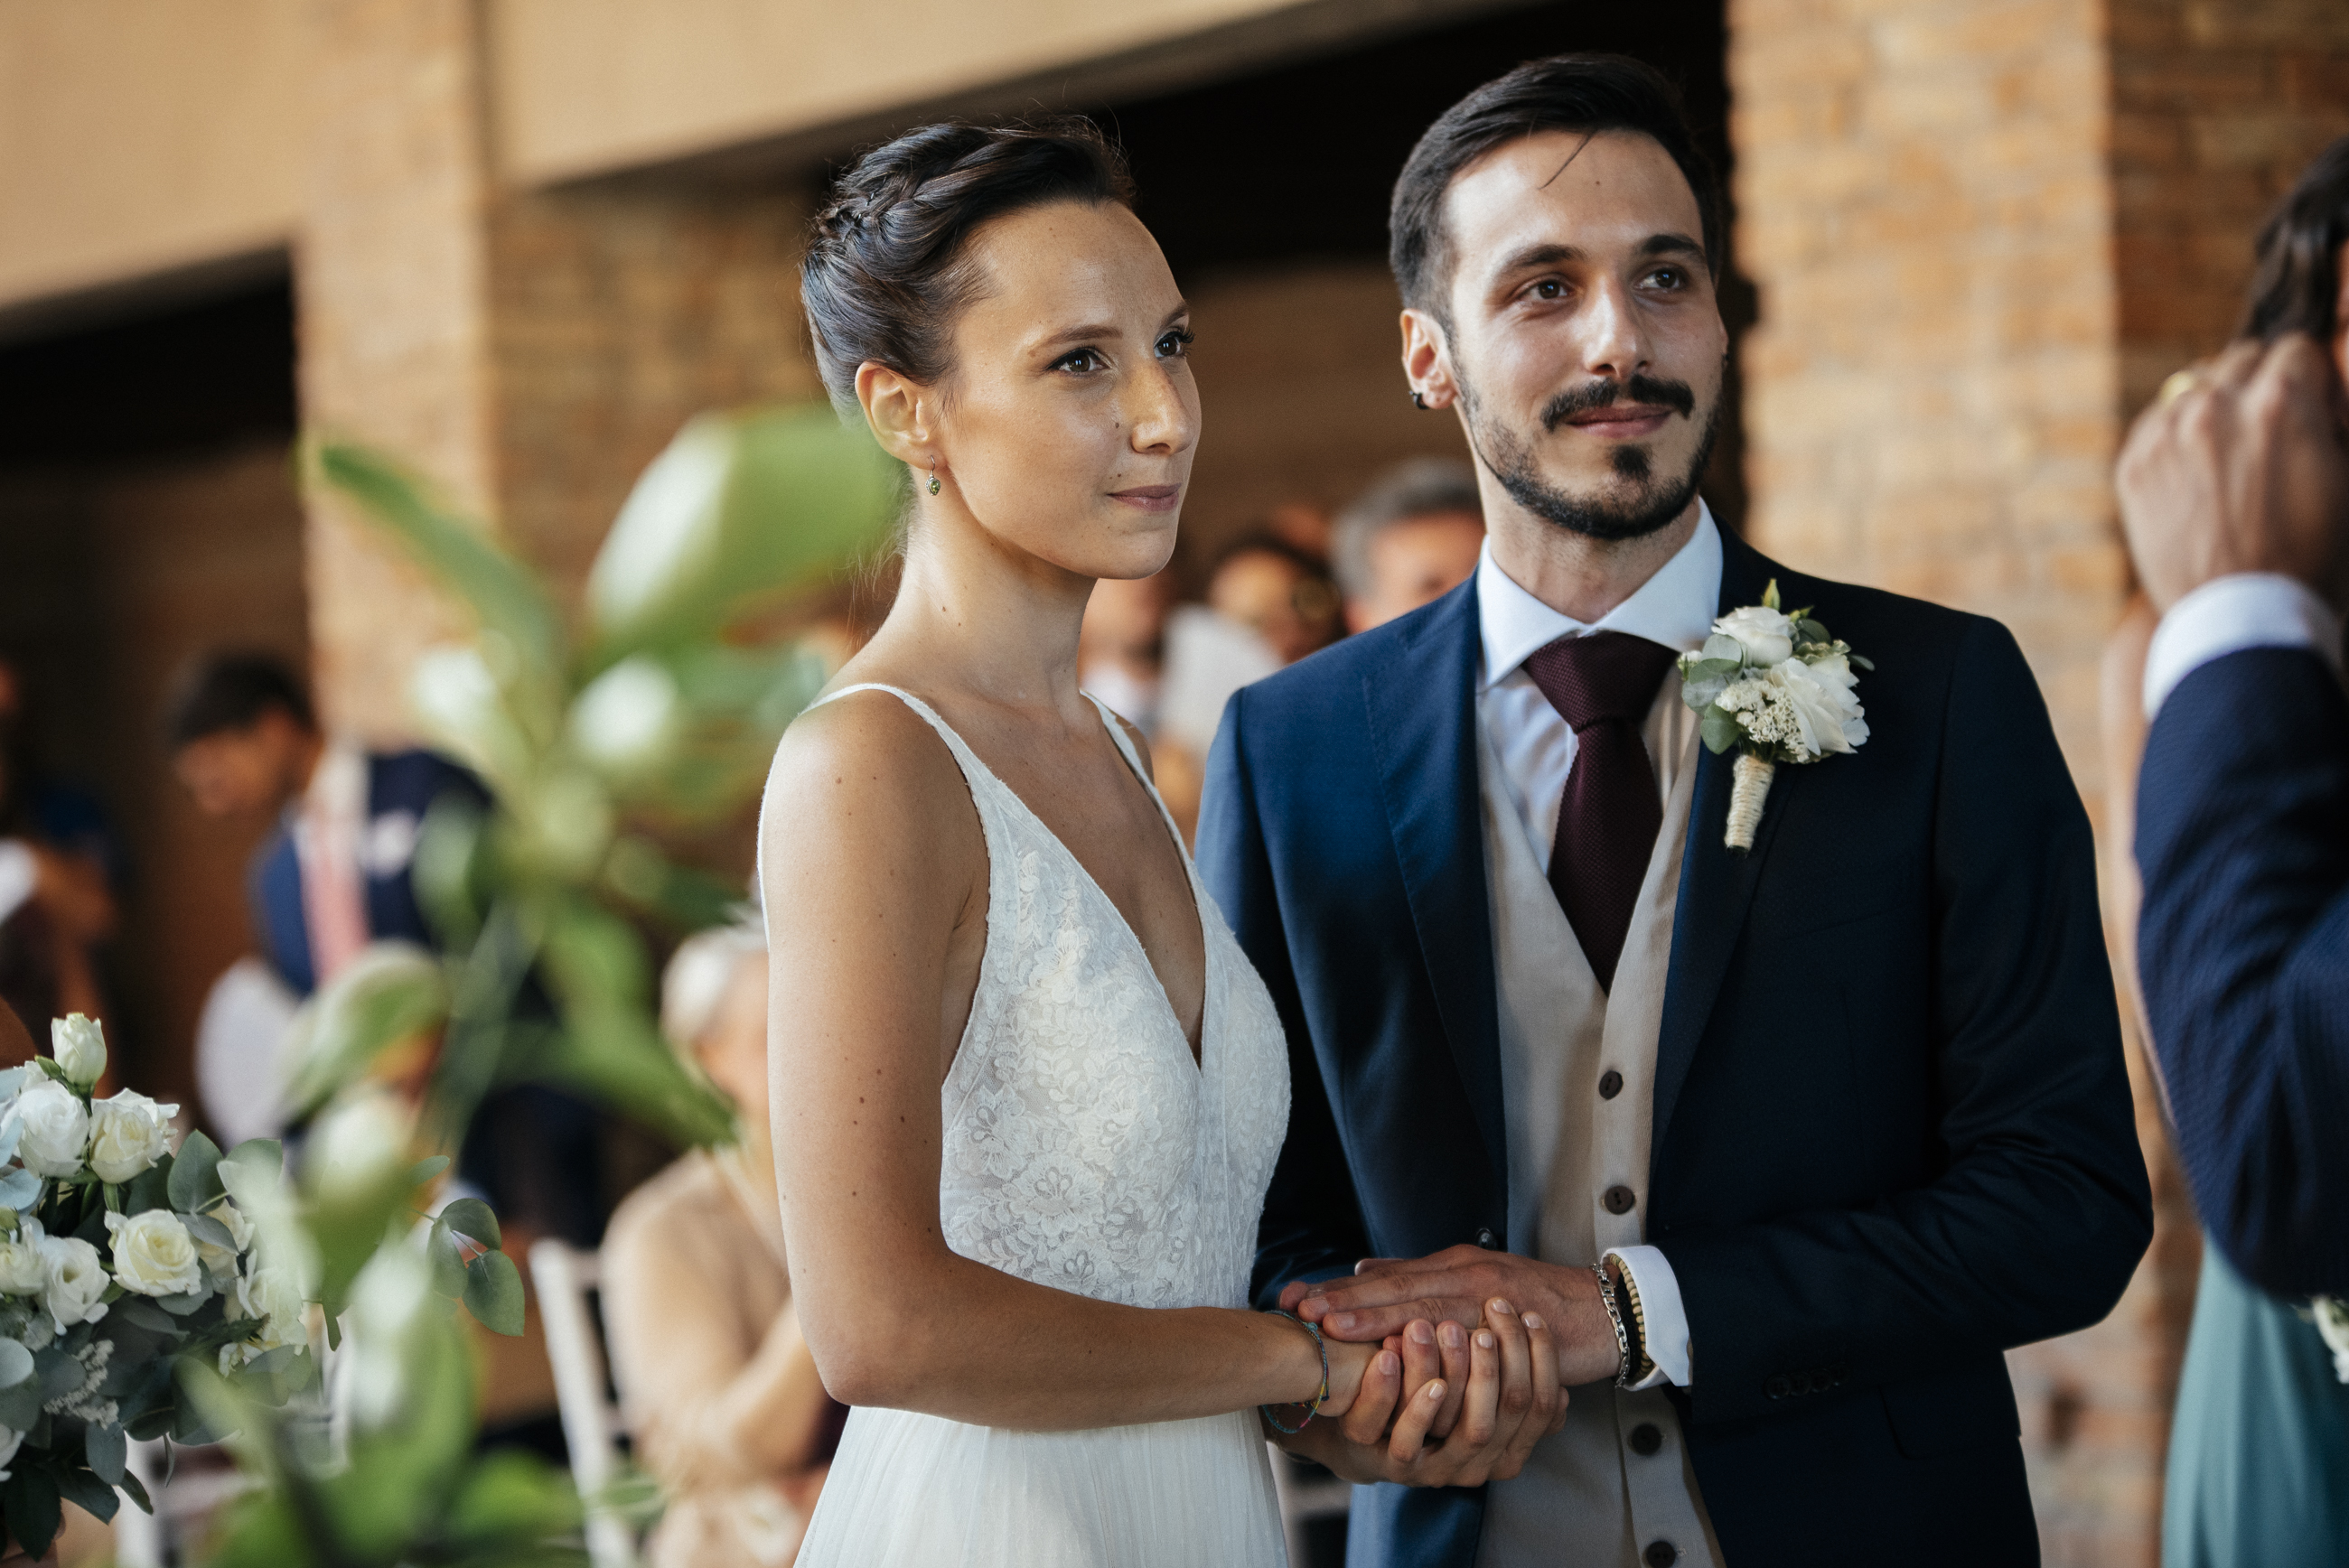 Chiara&Giacomo-52.jpg